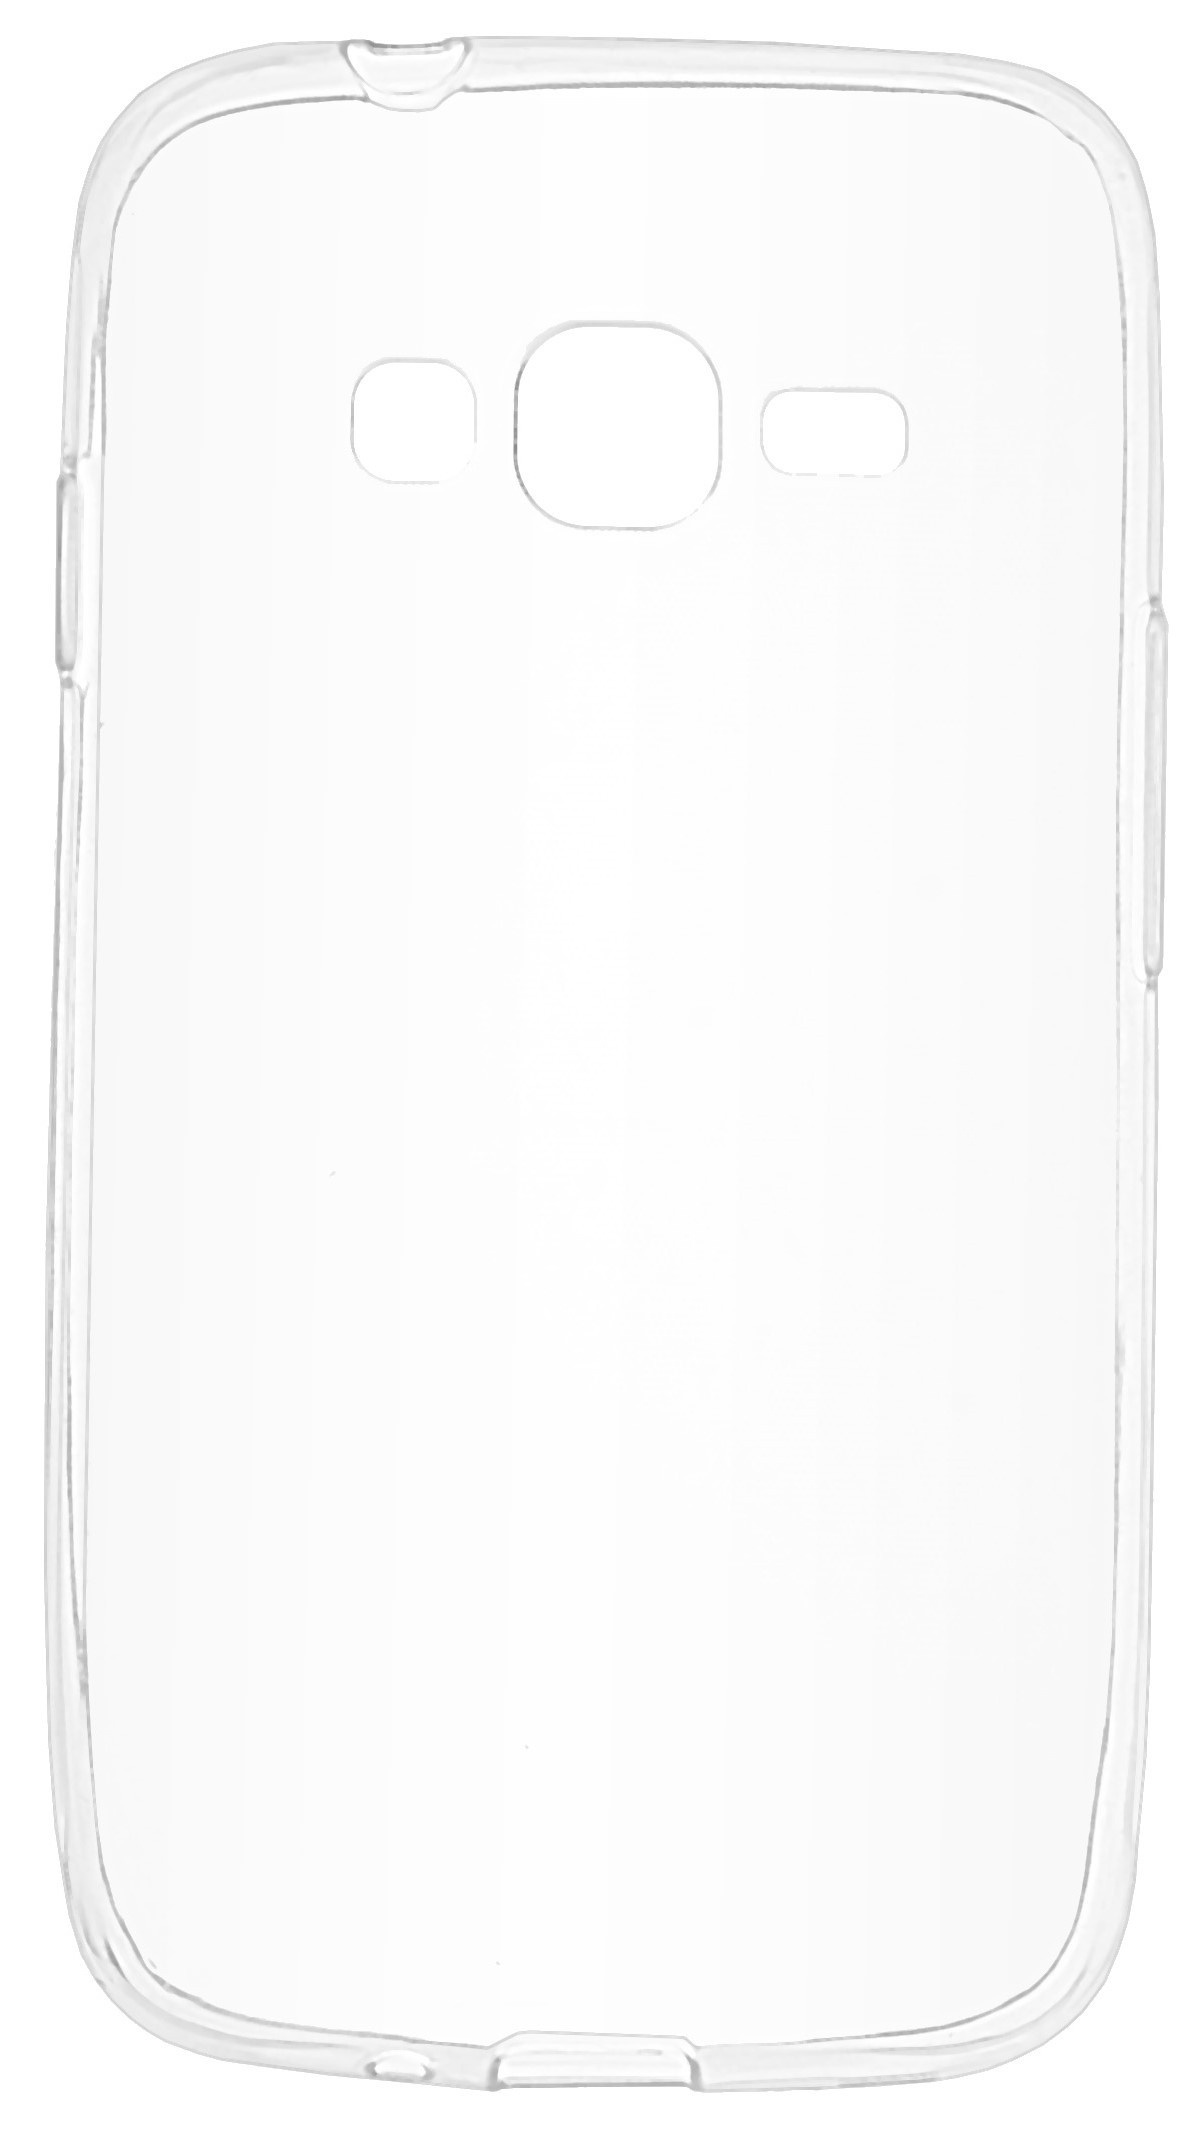 Чехол для сотового телефона skinBOX Slim Silicone, 4630042529809, прозрачный цена и фото